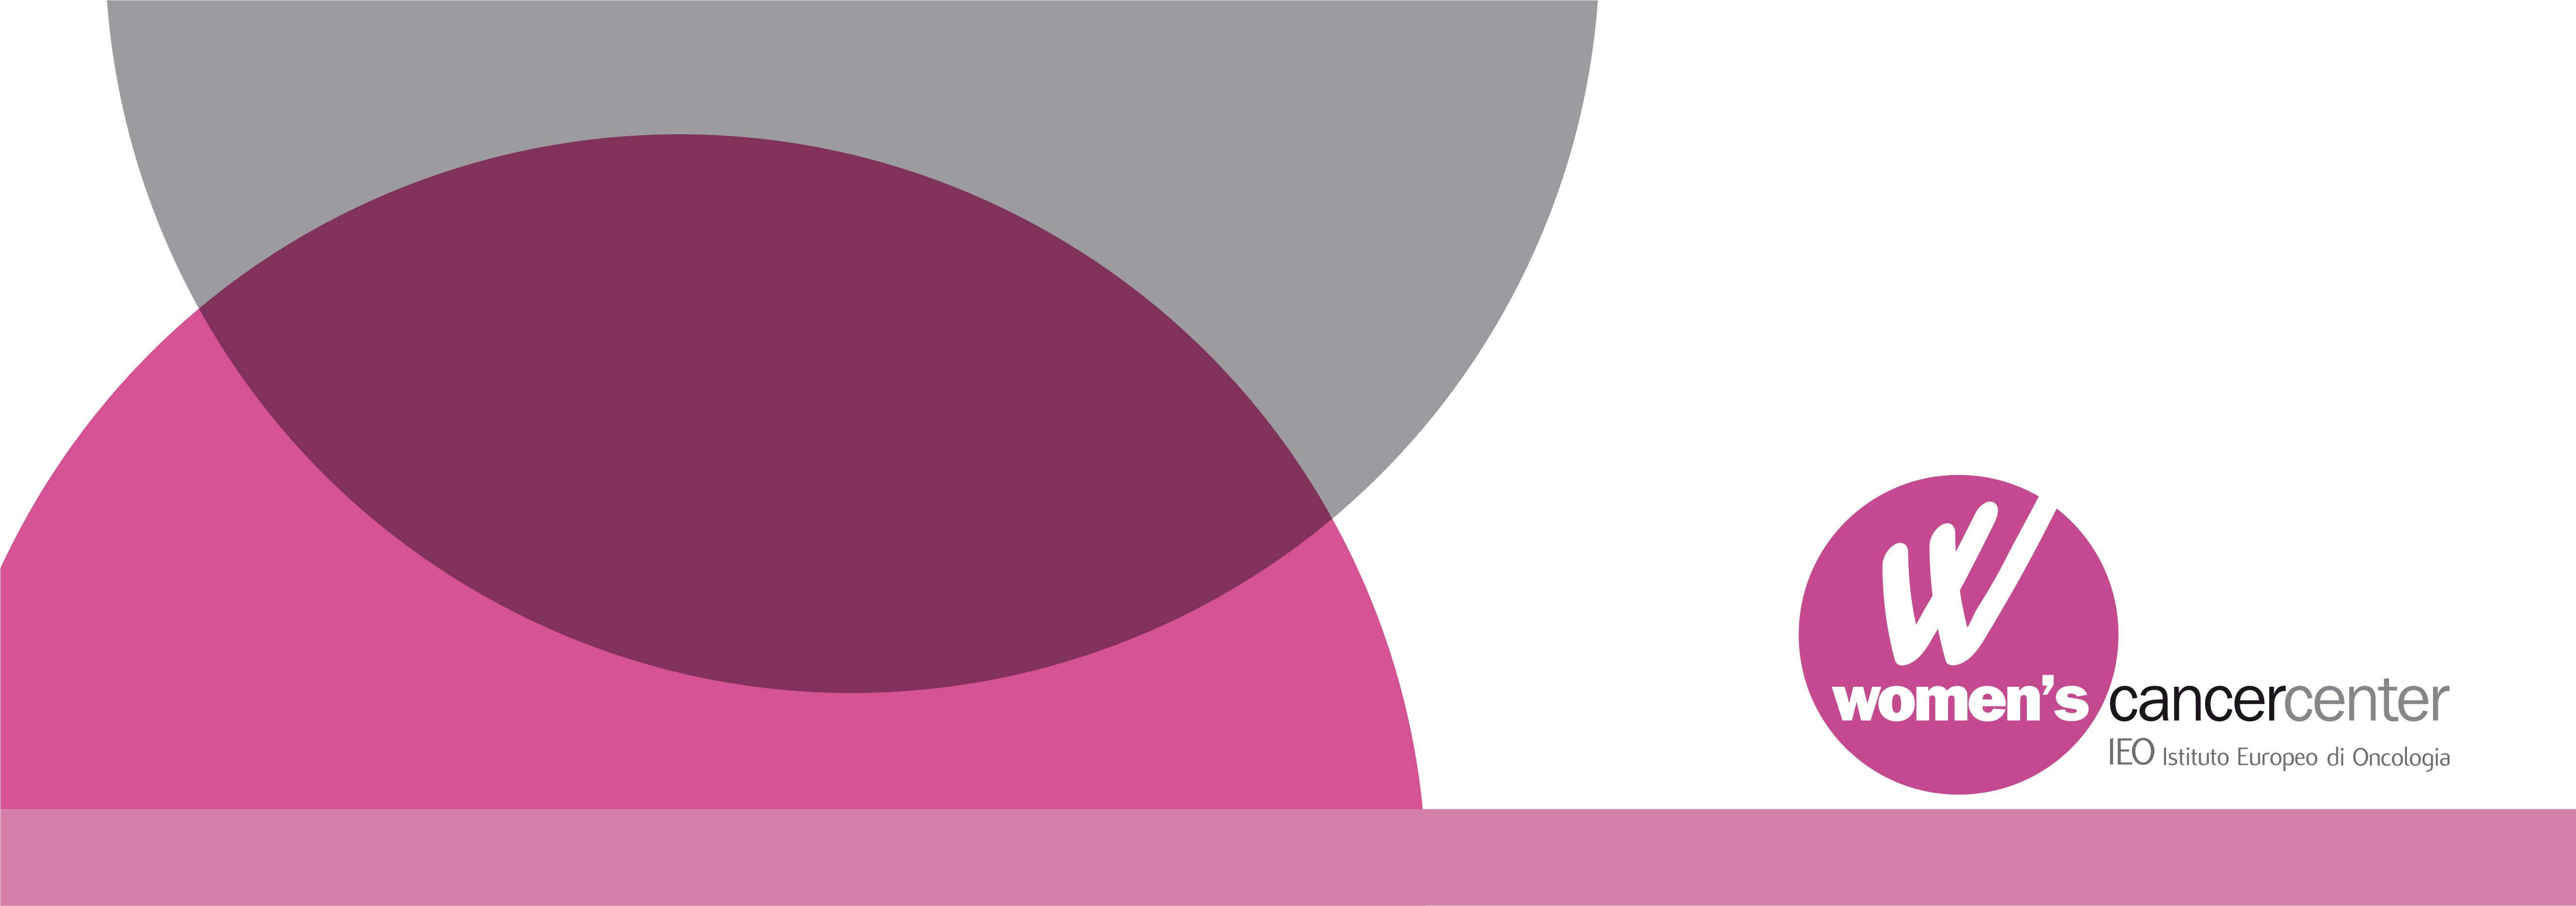 12 Oncologia I Hematologia Peditriques Web